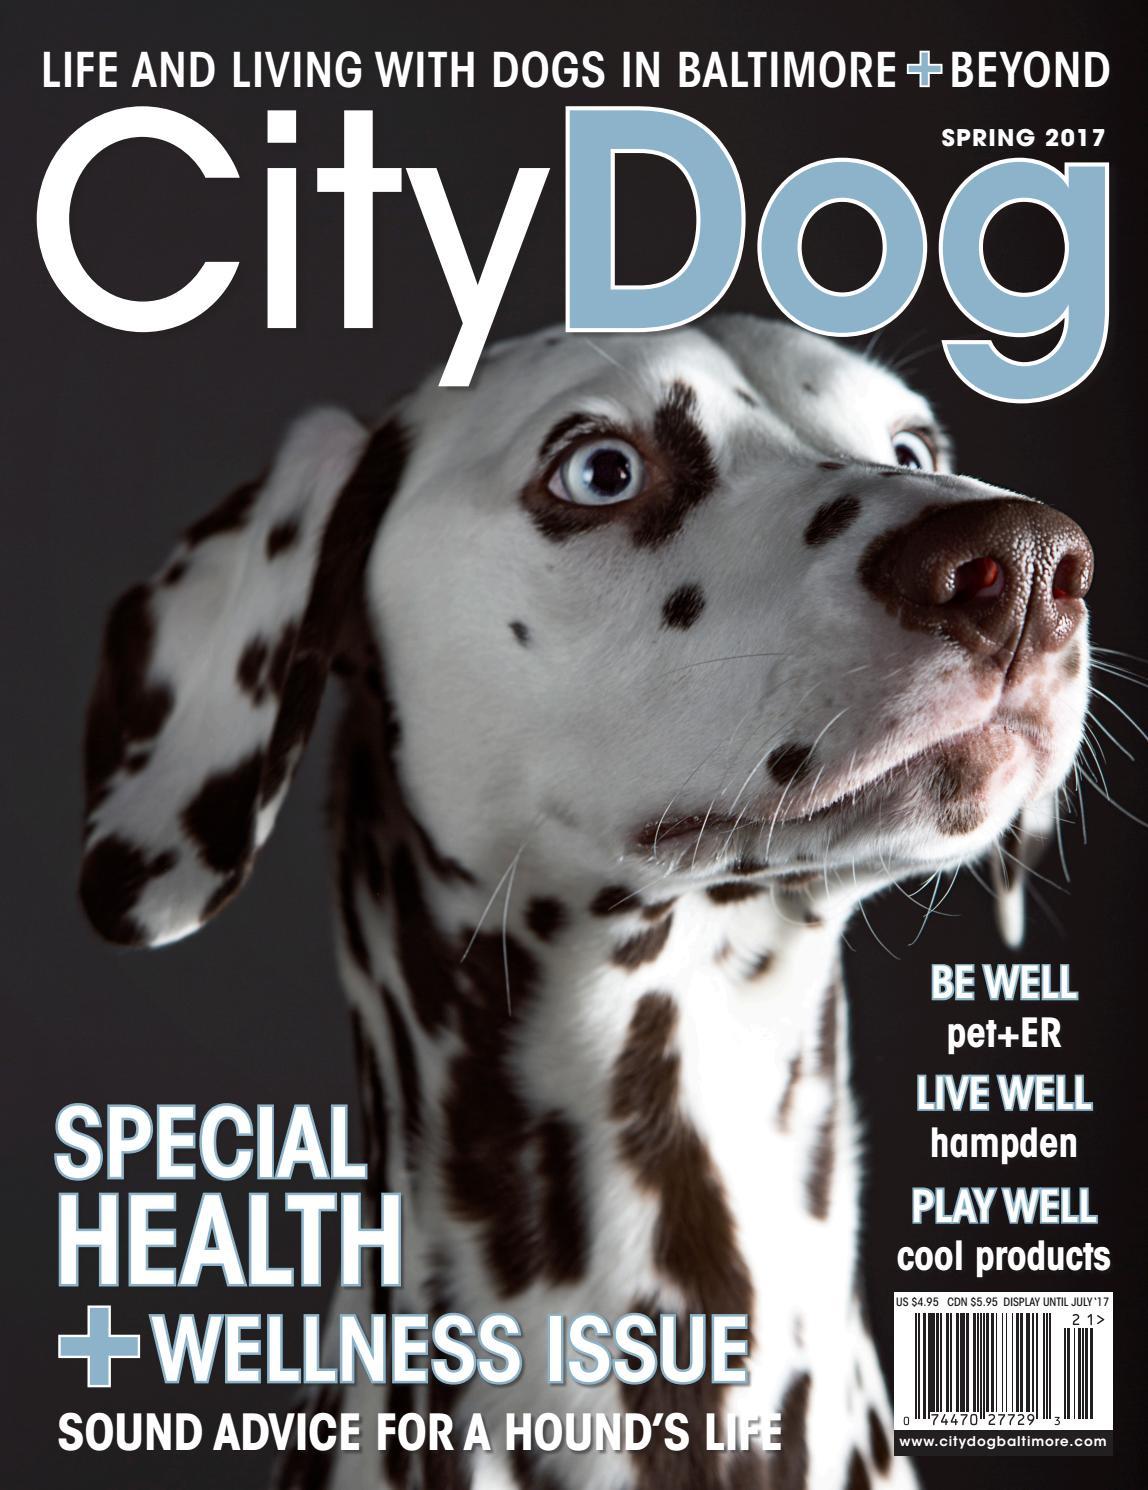 citydog baltimore spring 2017 issue by citydog magazine issuu